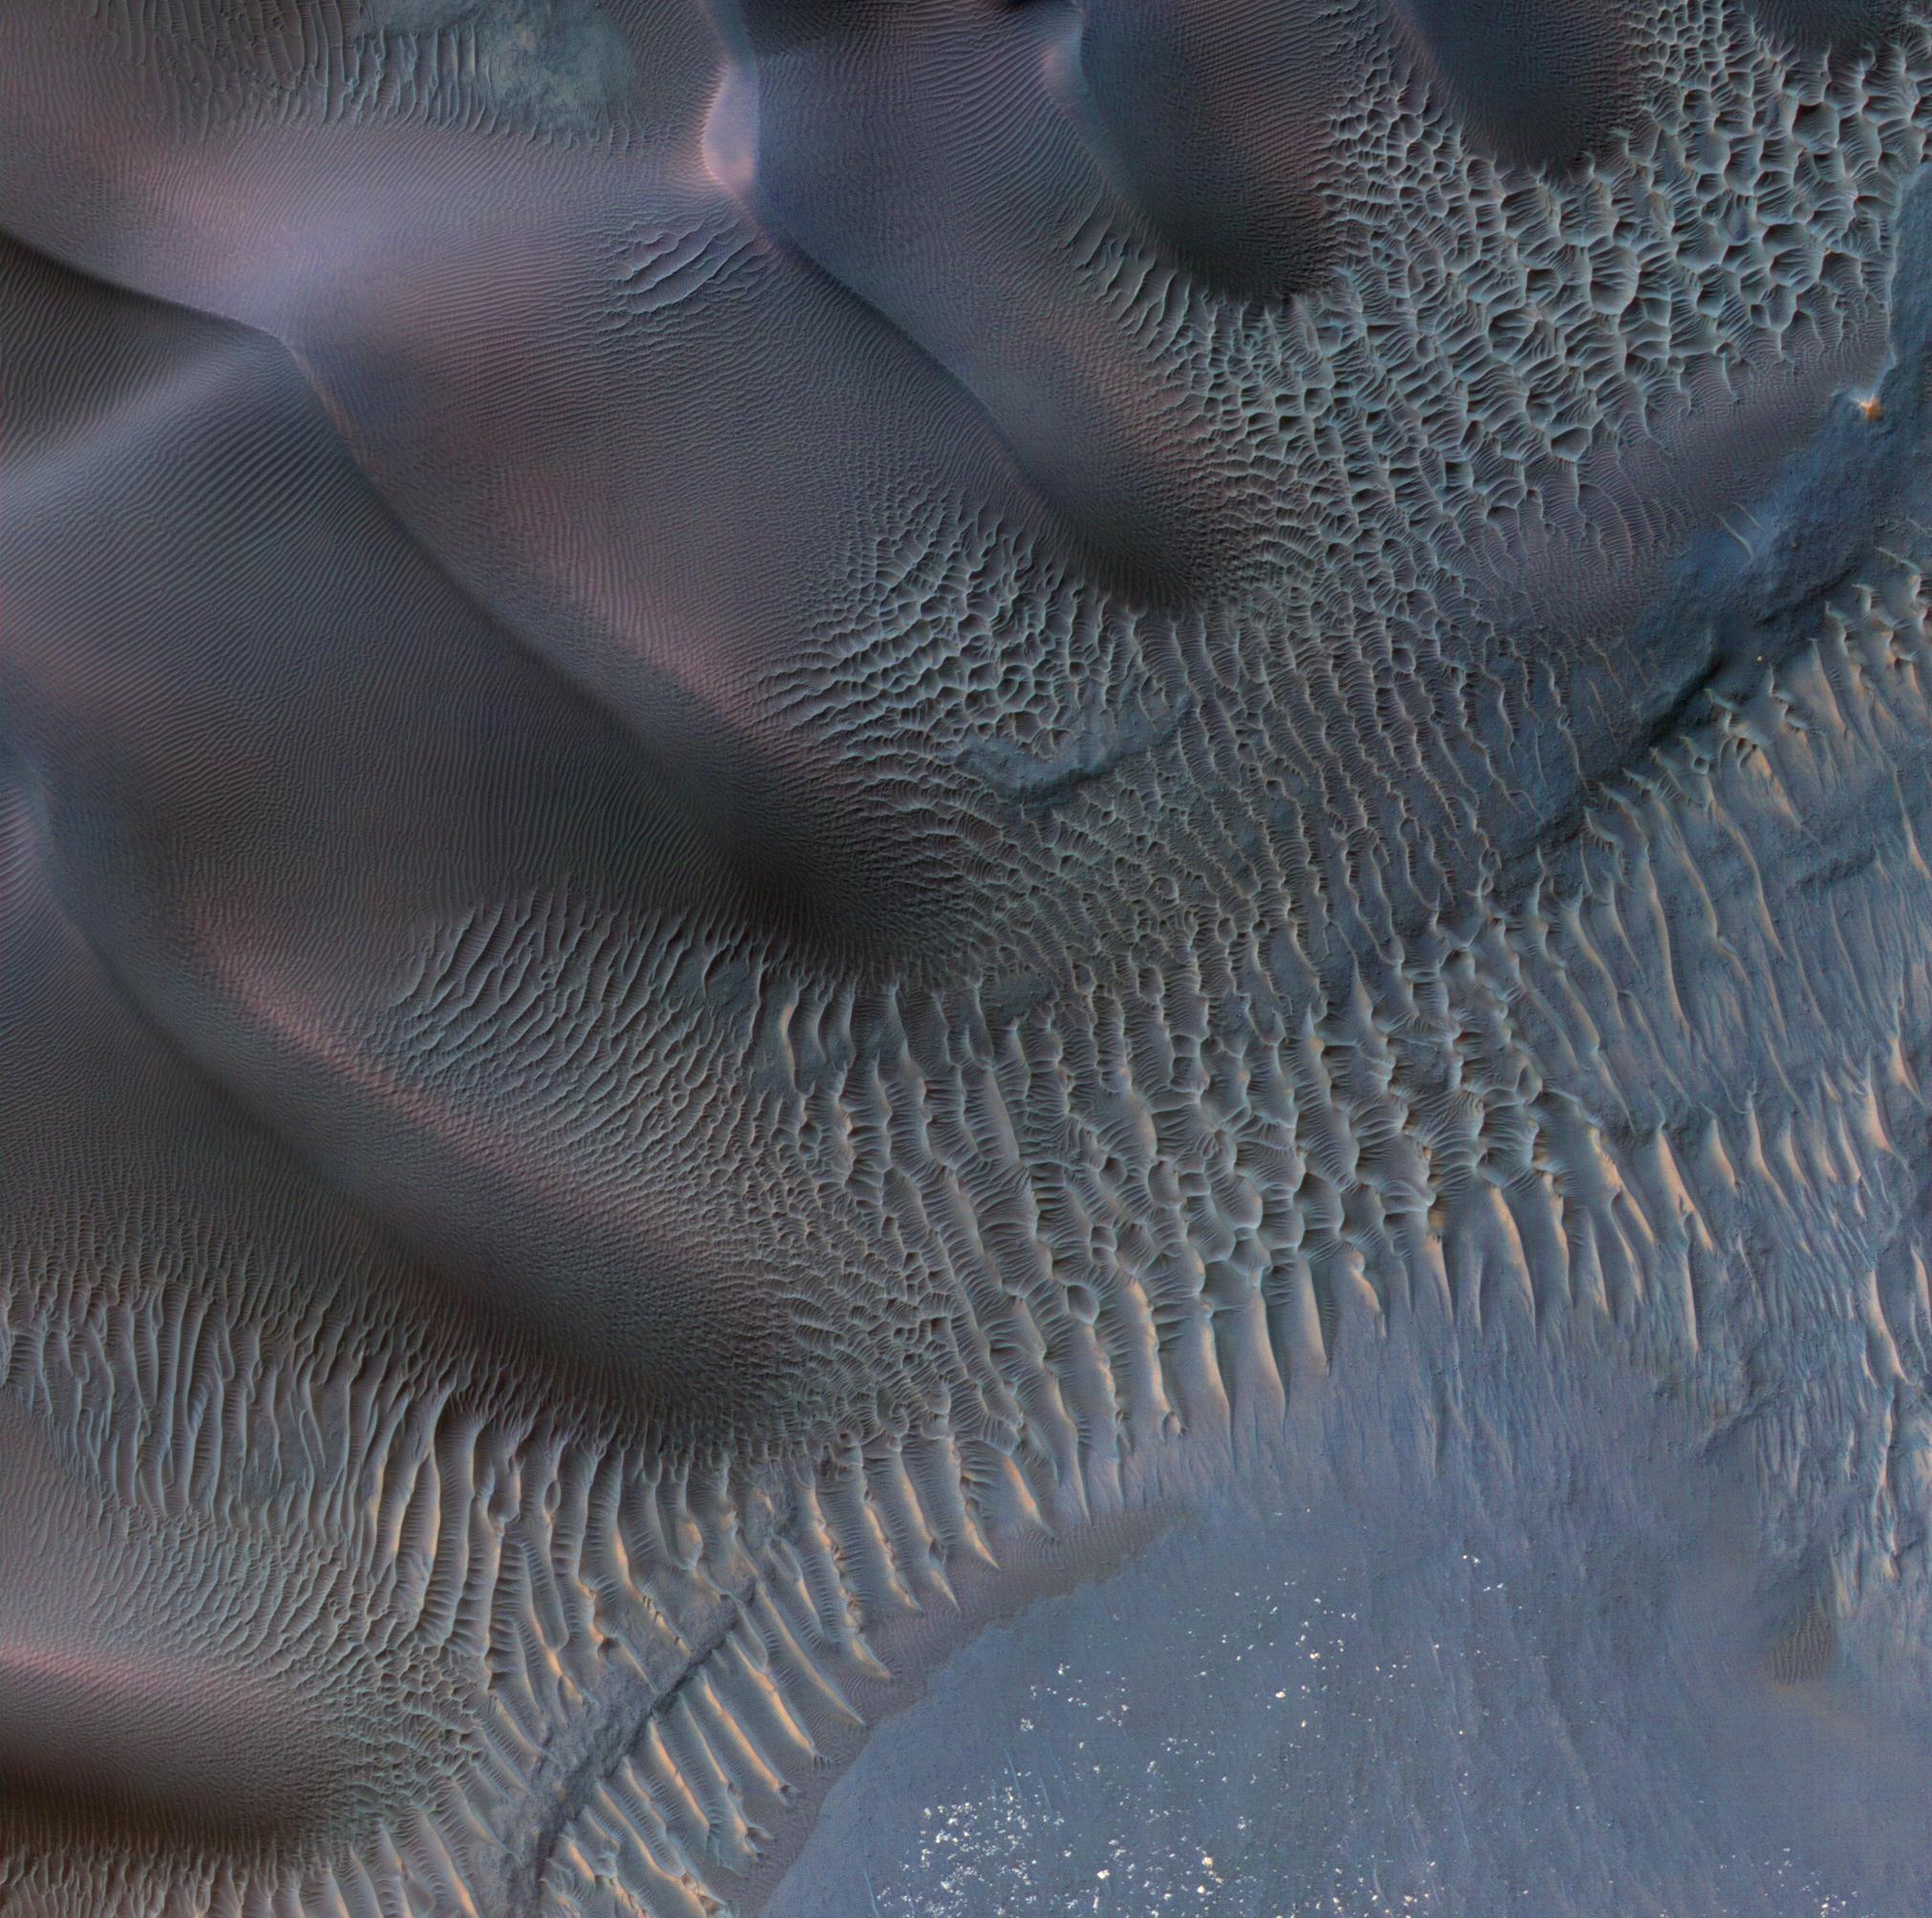 Dunes in Noachia Terra. Image credit: NASA/JPL/Caltech/University of Arizona